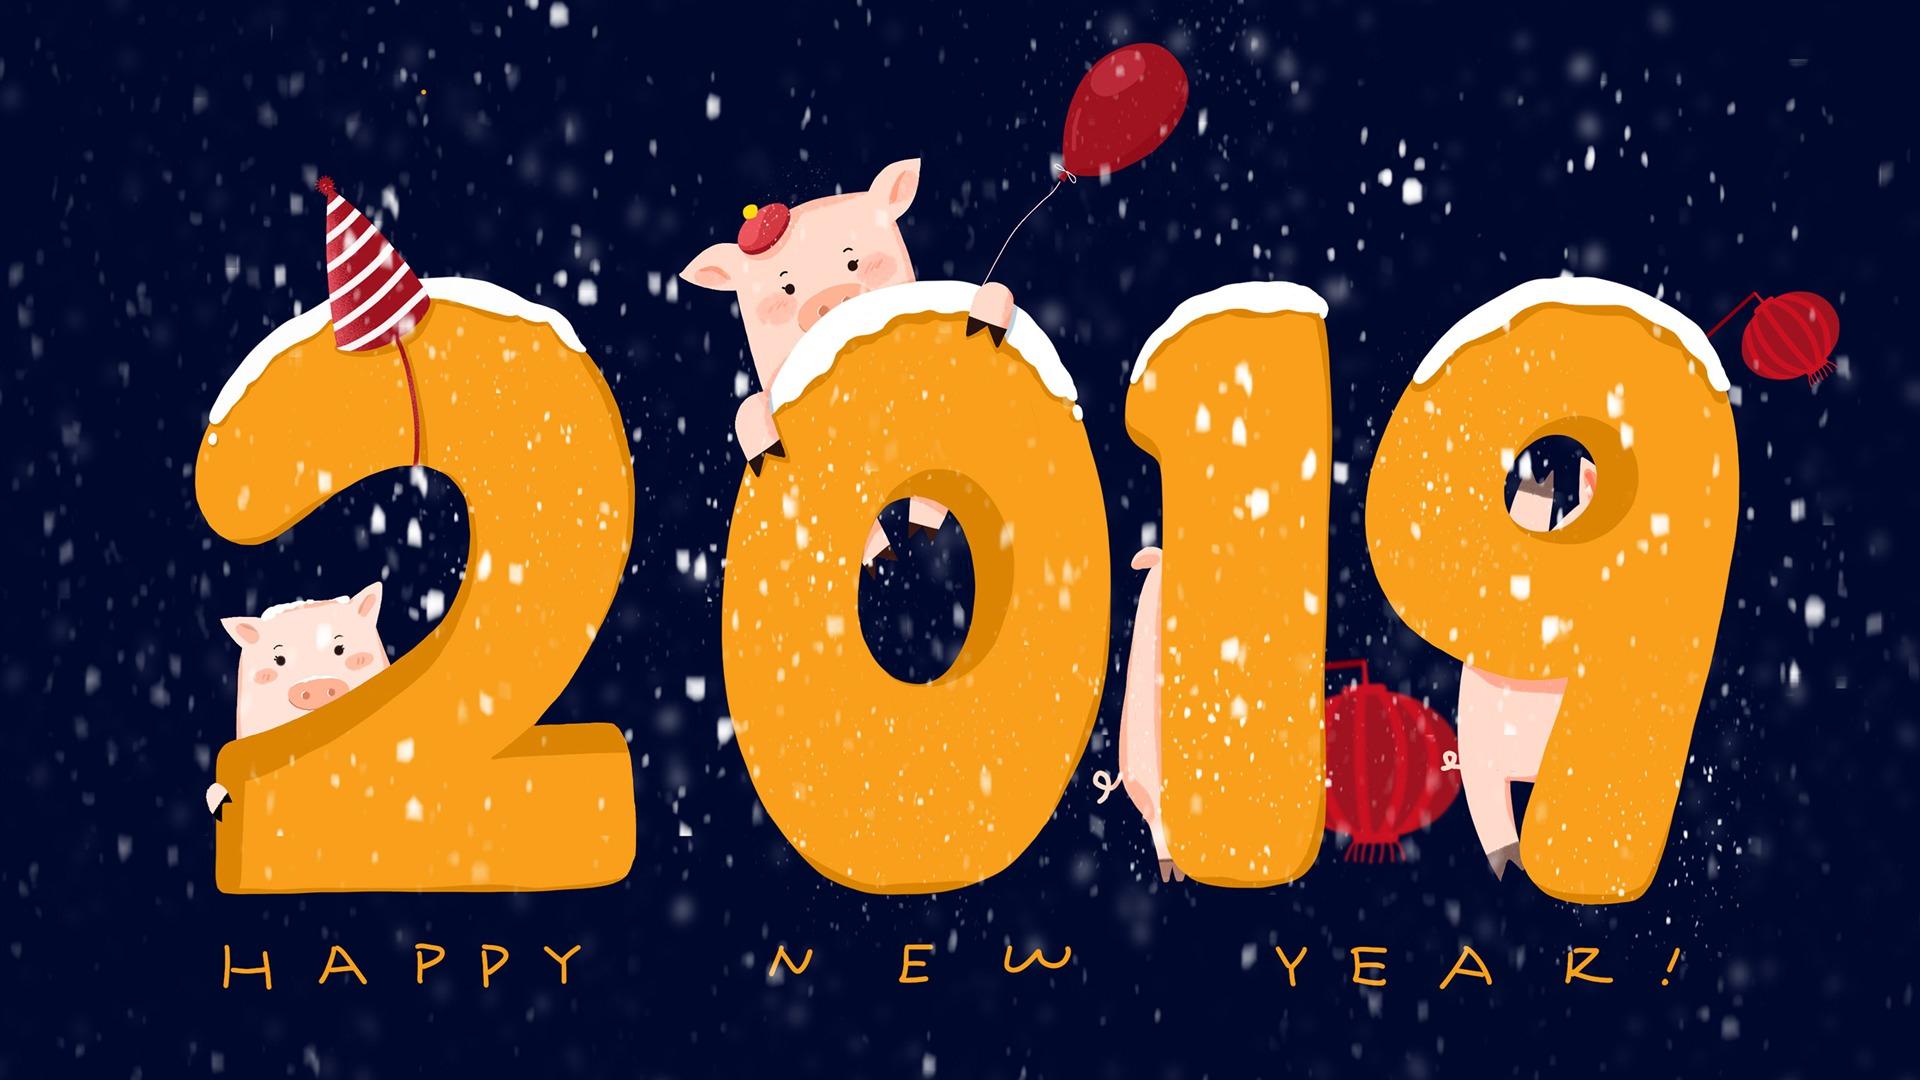 Happy New Year 2019 Winter Cute Pigs HD Wallpaper 1920x1080